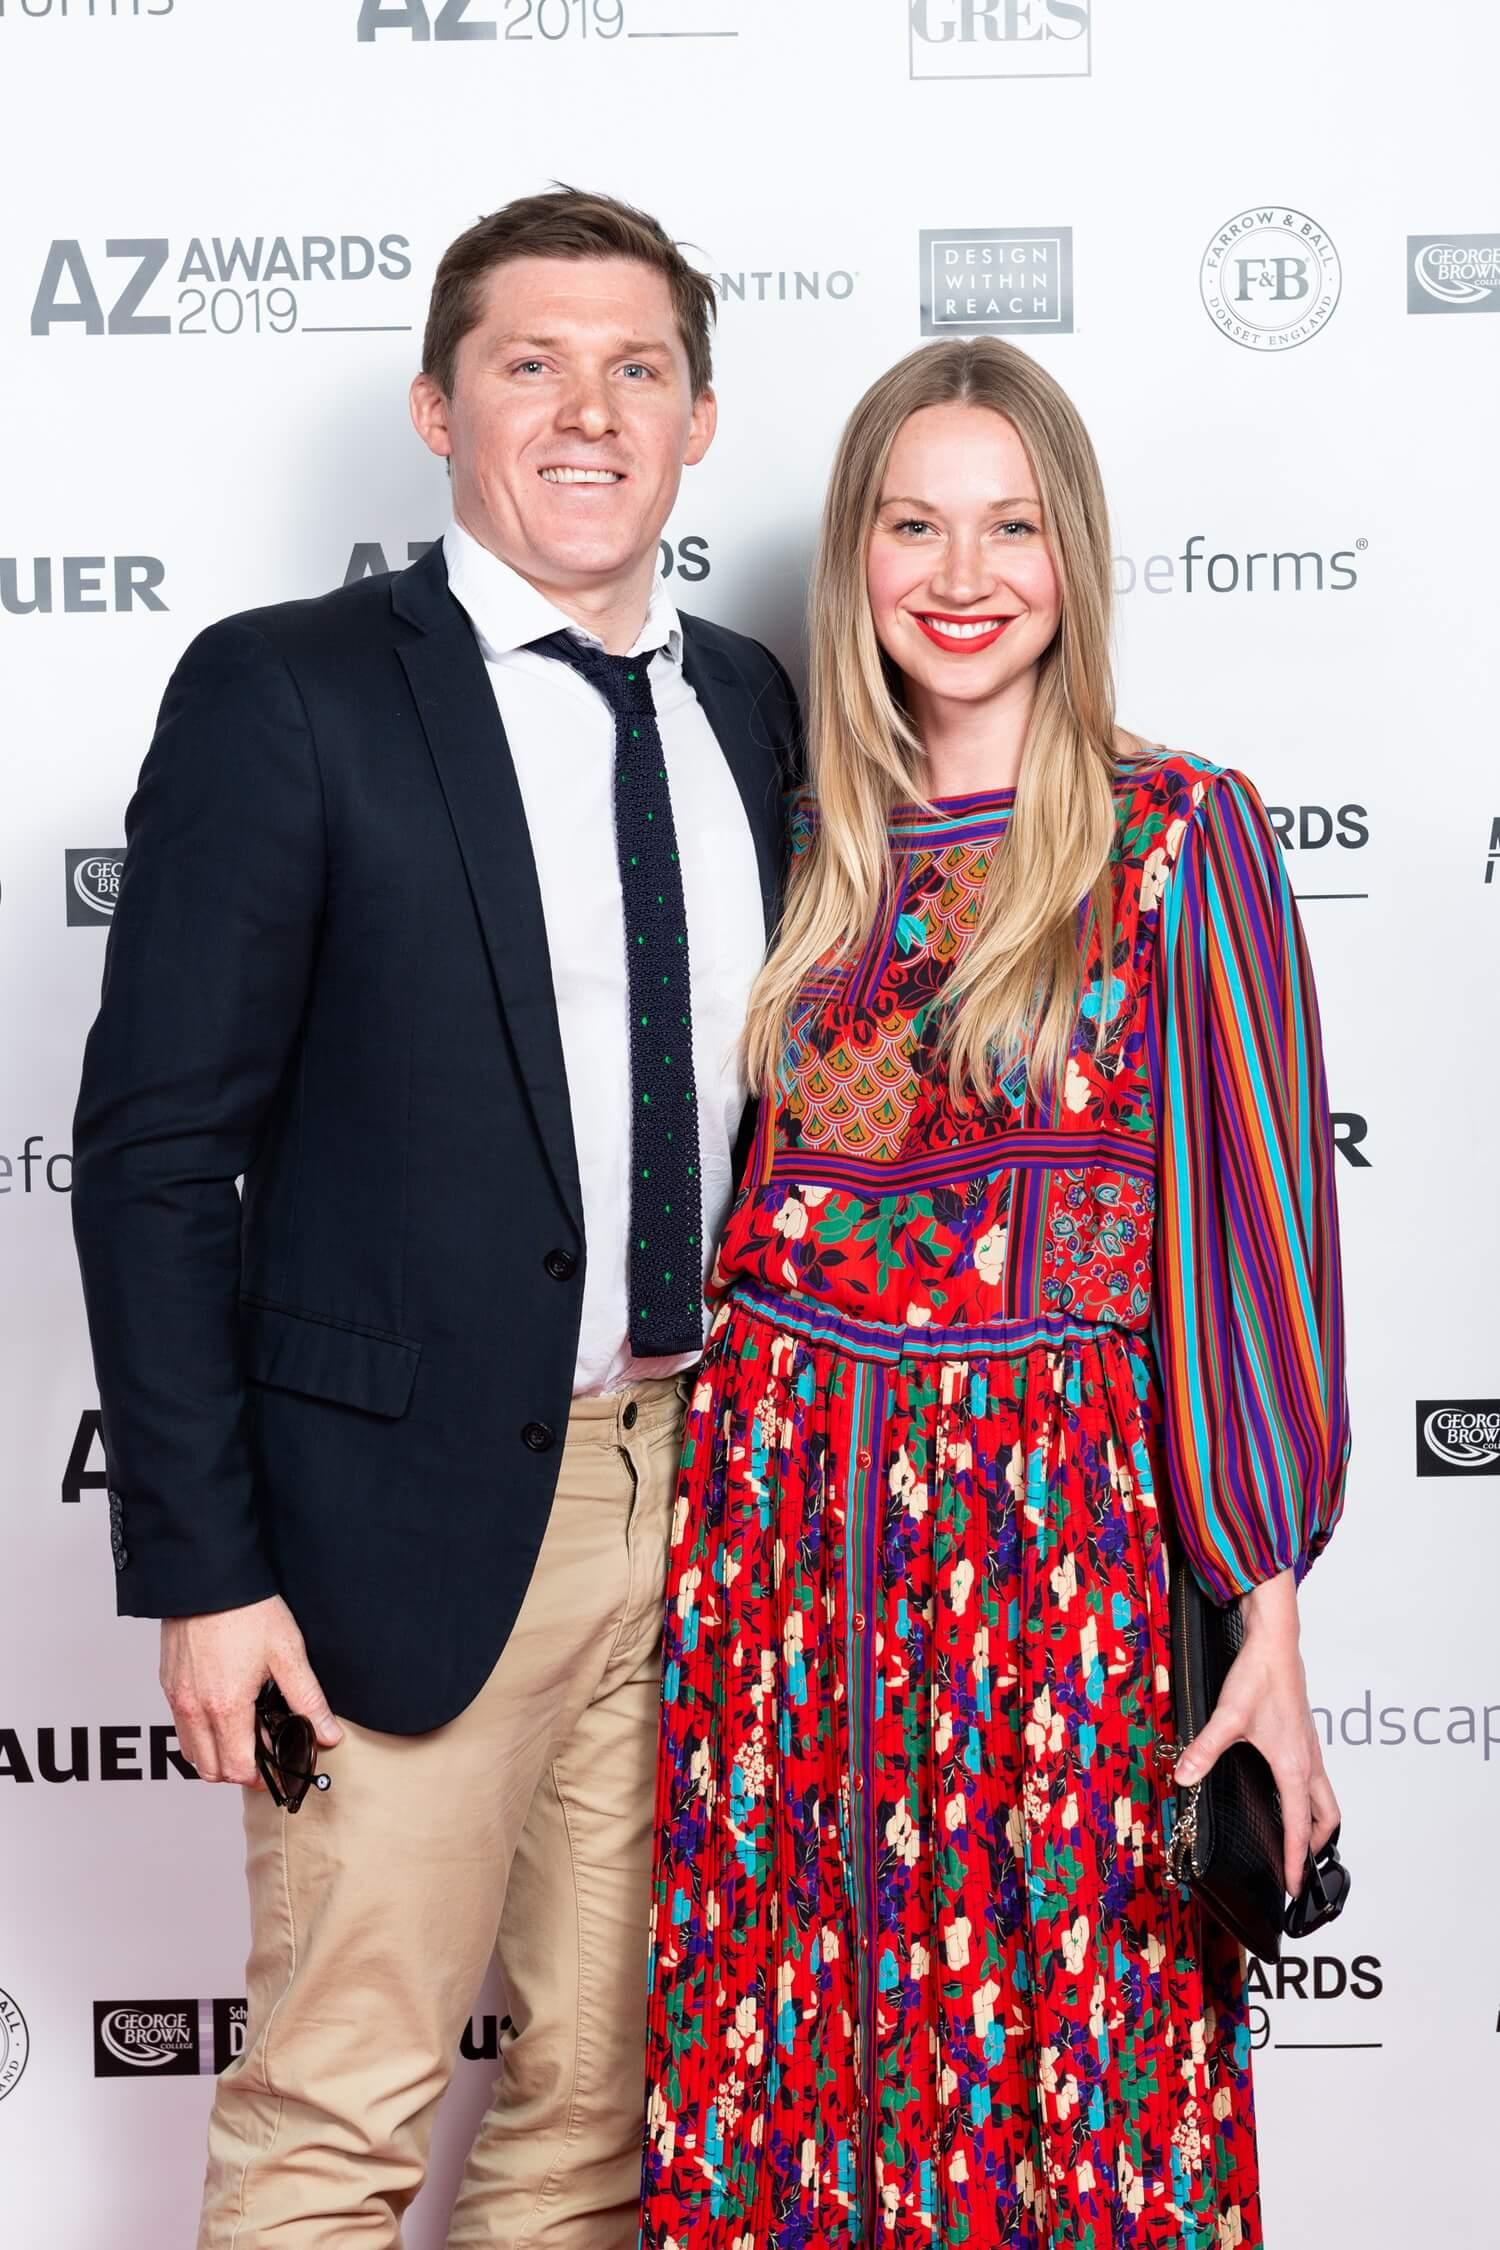 Luke and Alexandra Chang-Hunter of Turf Design Studio, AZ Awards winners in Environmental Leadership, AZ Awards 2019: Scenes from the Gala